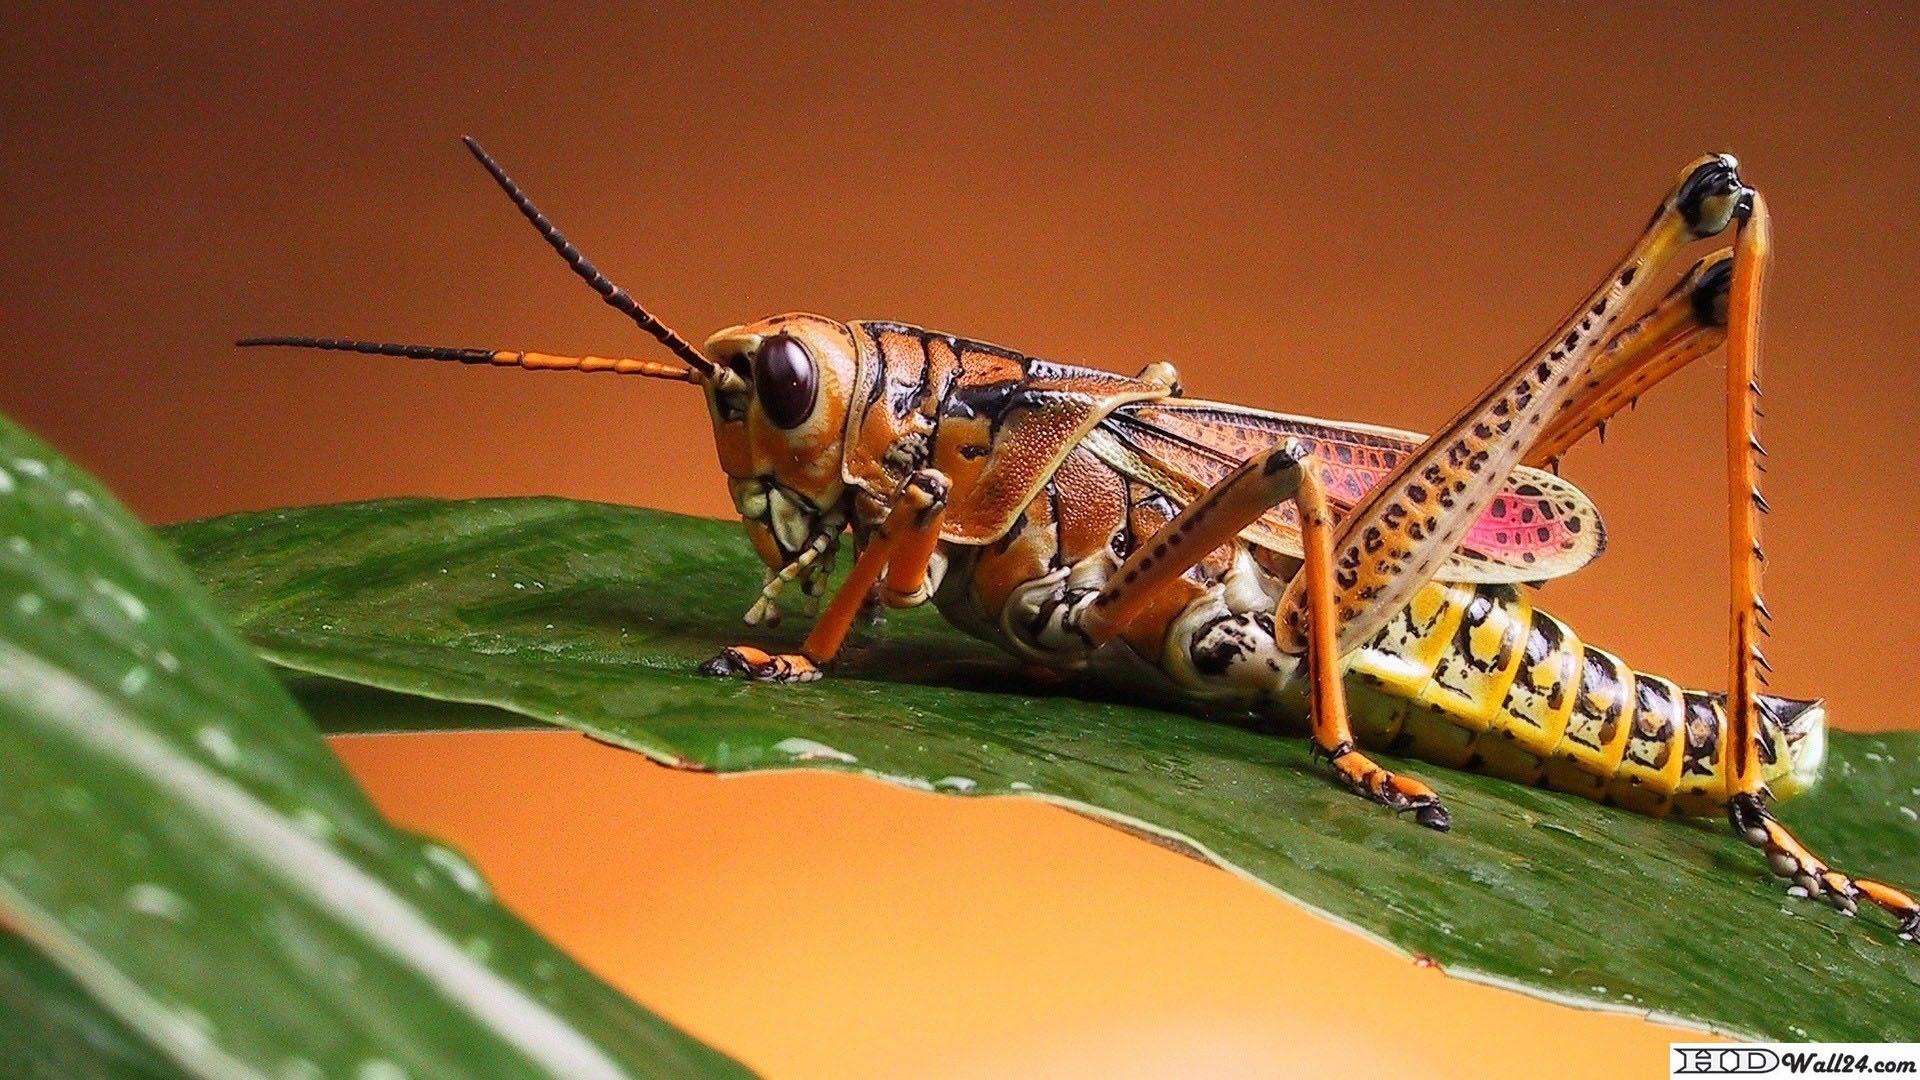 grasshopper wallpapers | free hd wallpaper download | http